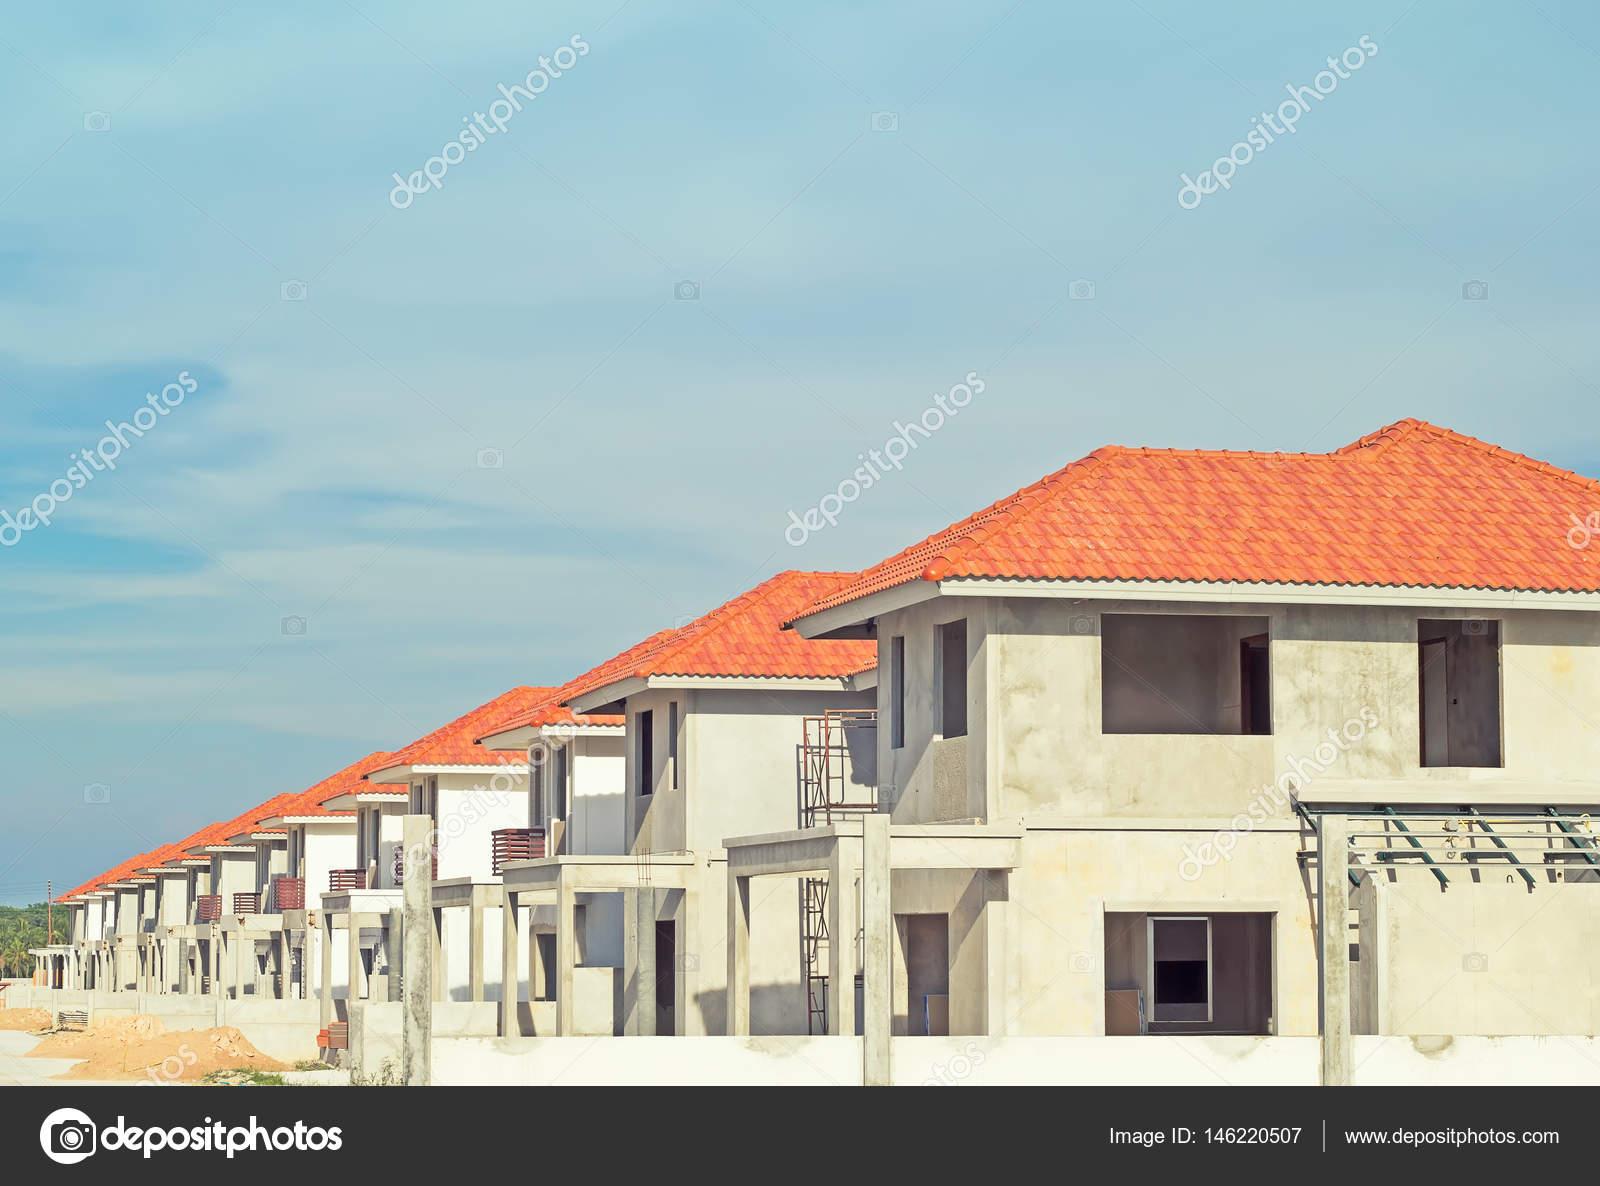 Huis bouwen best bouwbedrijf bouwfirma bouwteam duurzaam for Wat kost eigen huis bouwen